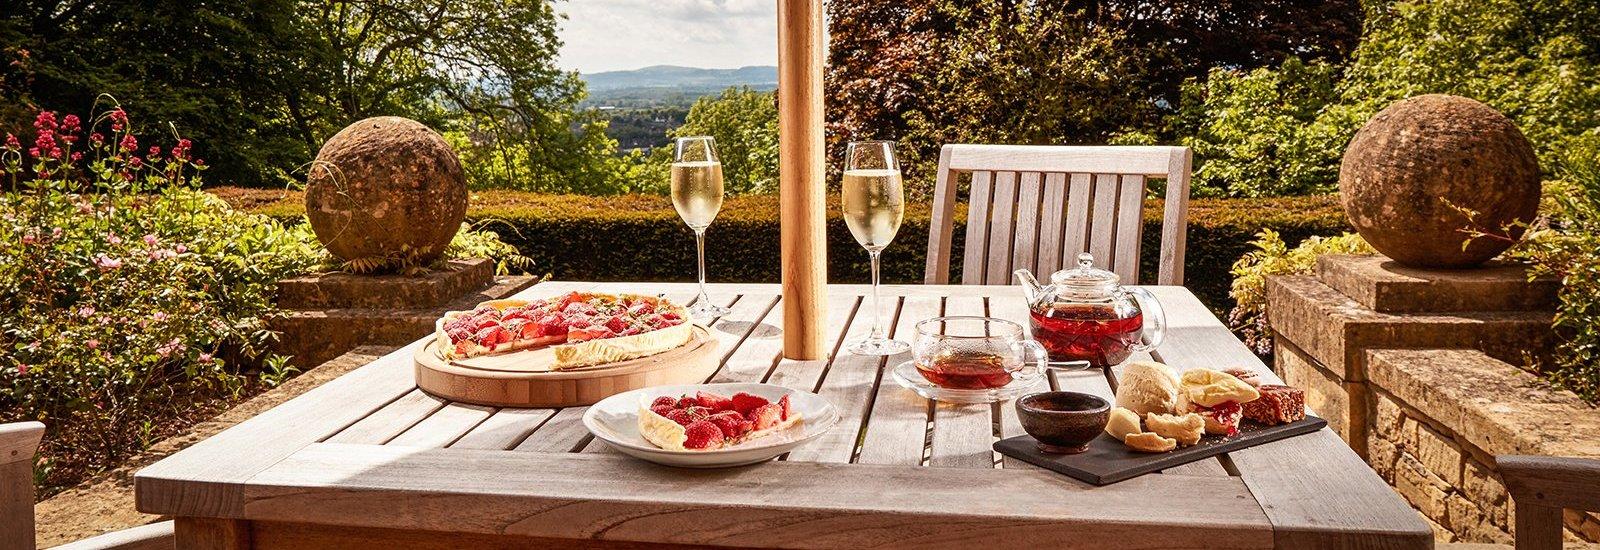 31bb5d8c5bdb The Best Gourmet Restaurants to Visit in England - Christie s ...